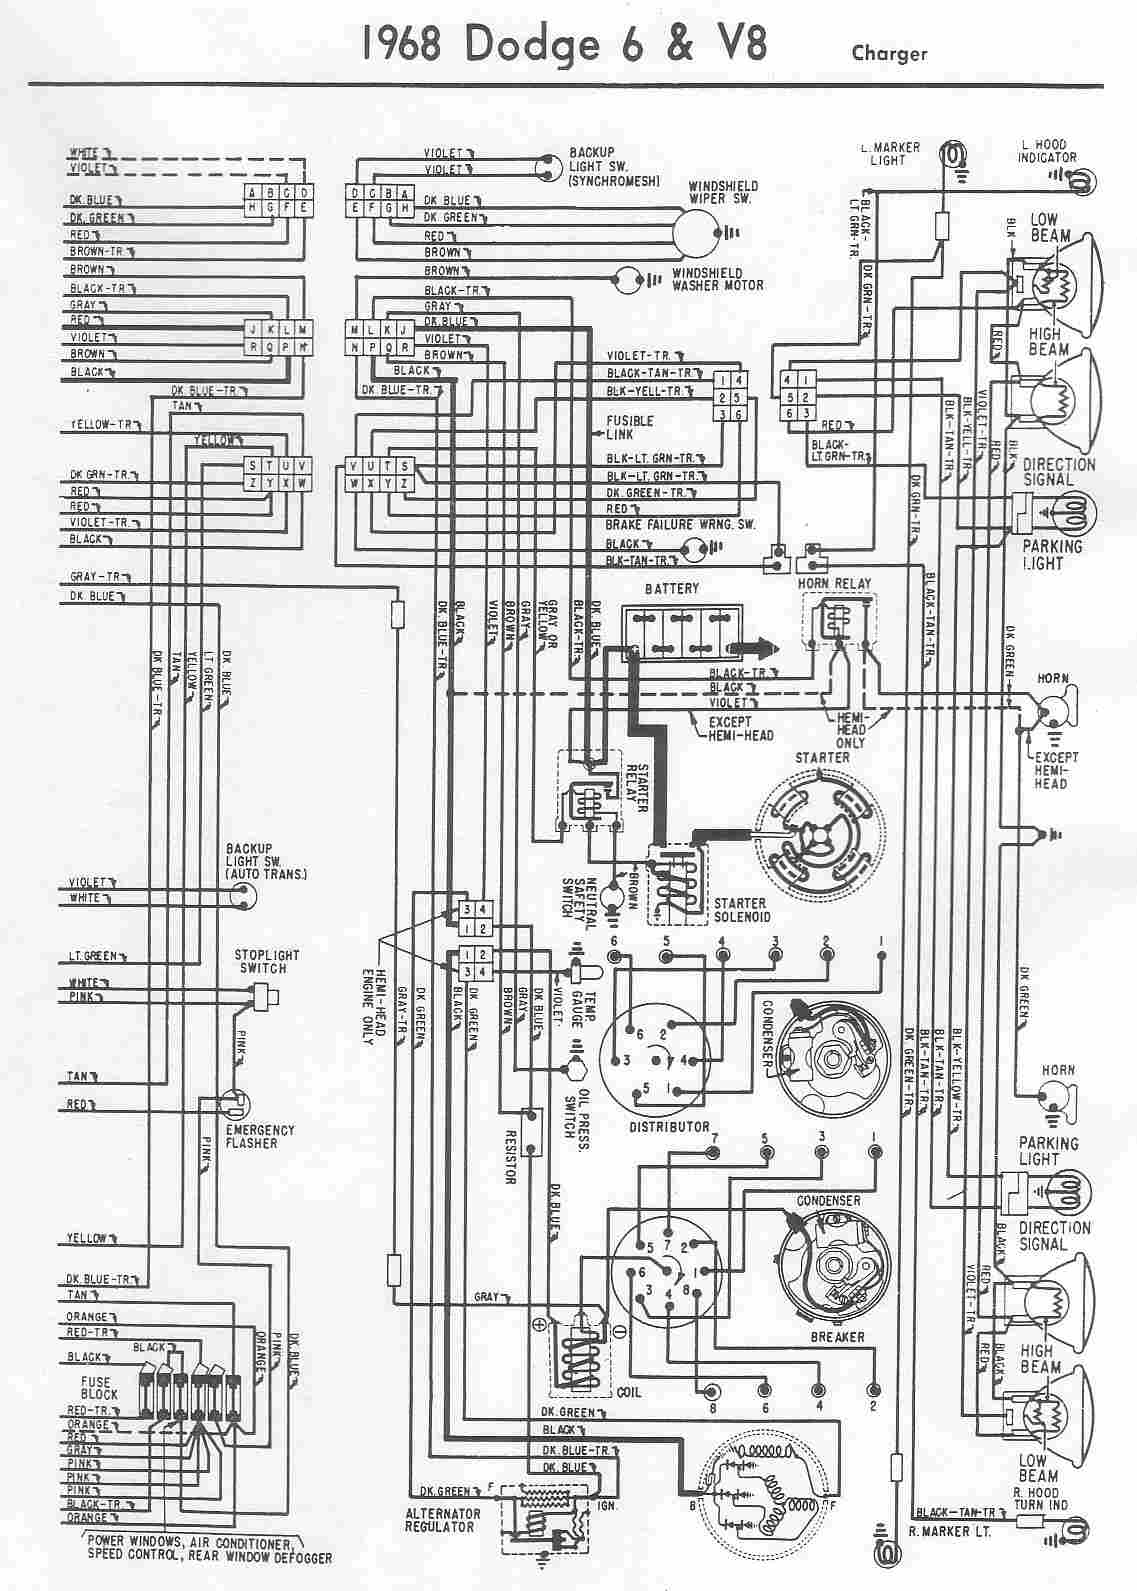 medium resolution of 2003 dodge stratus 2 7 engine diagram wiring library rh 99 mac happen de 04 dodge stratus engine diagram 2001 dodge stratus engine diagram